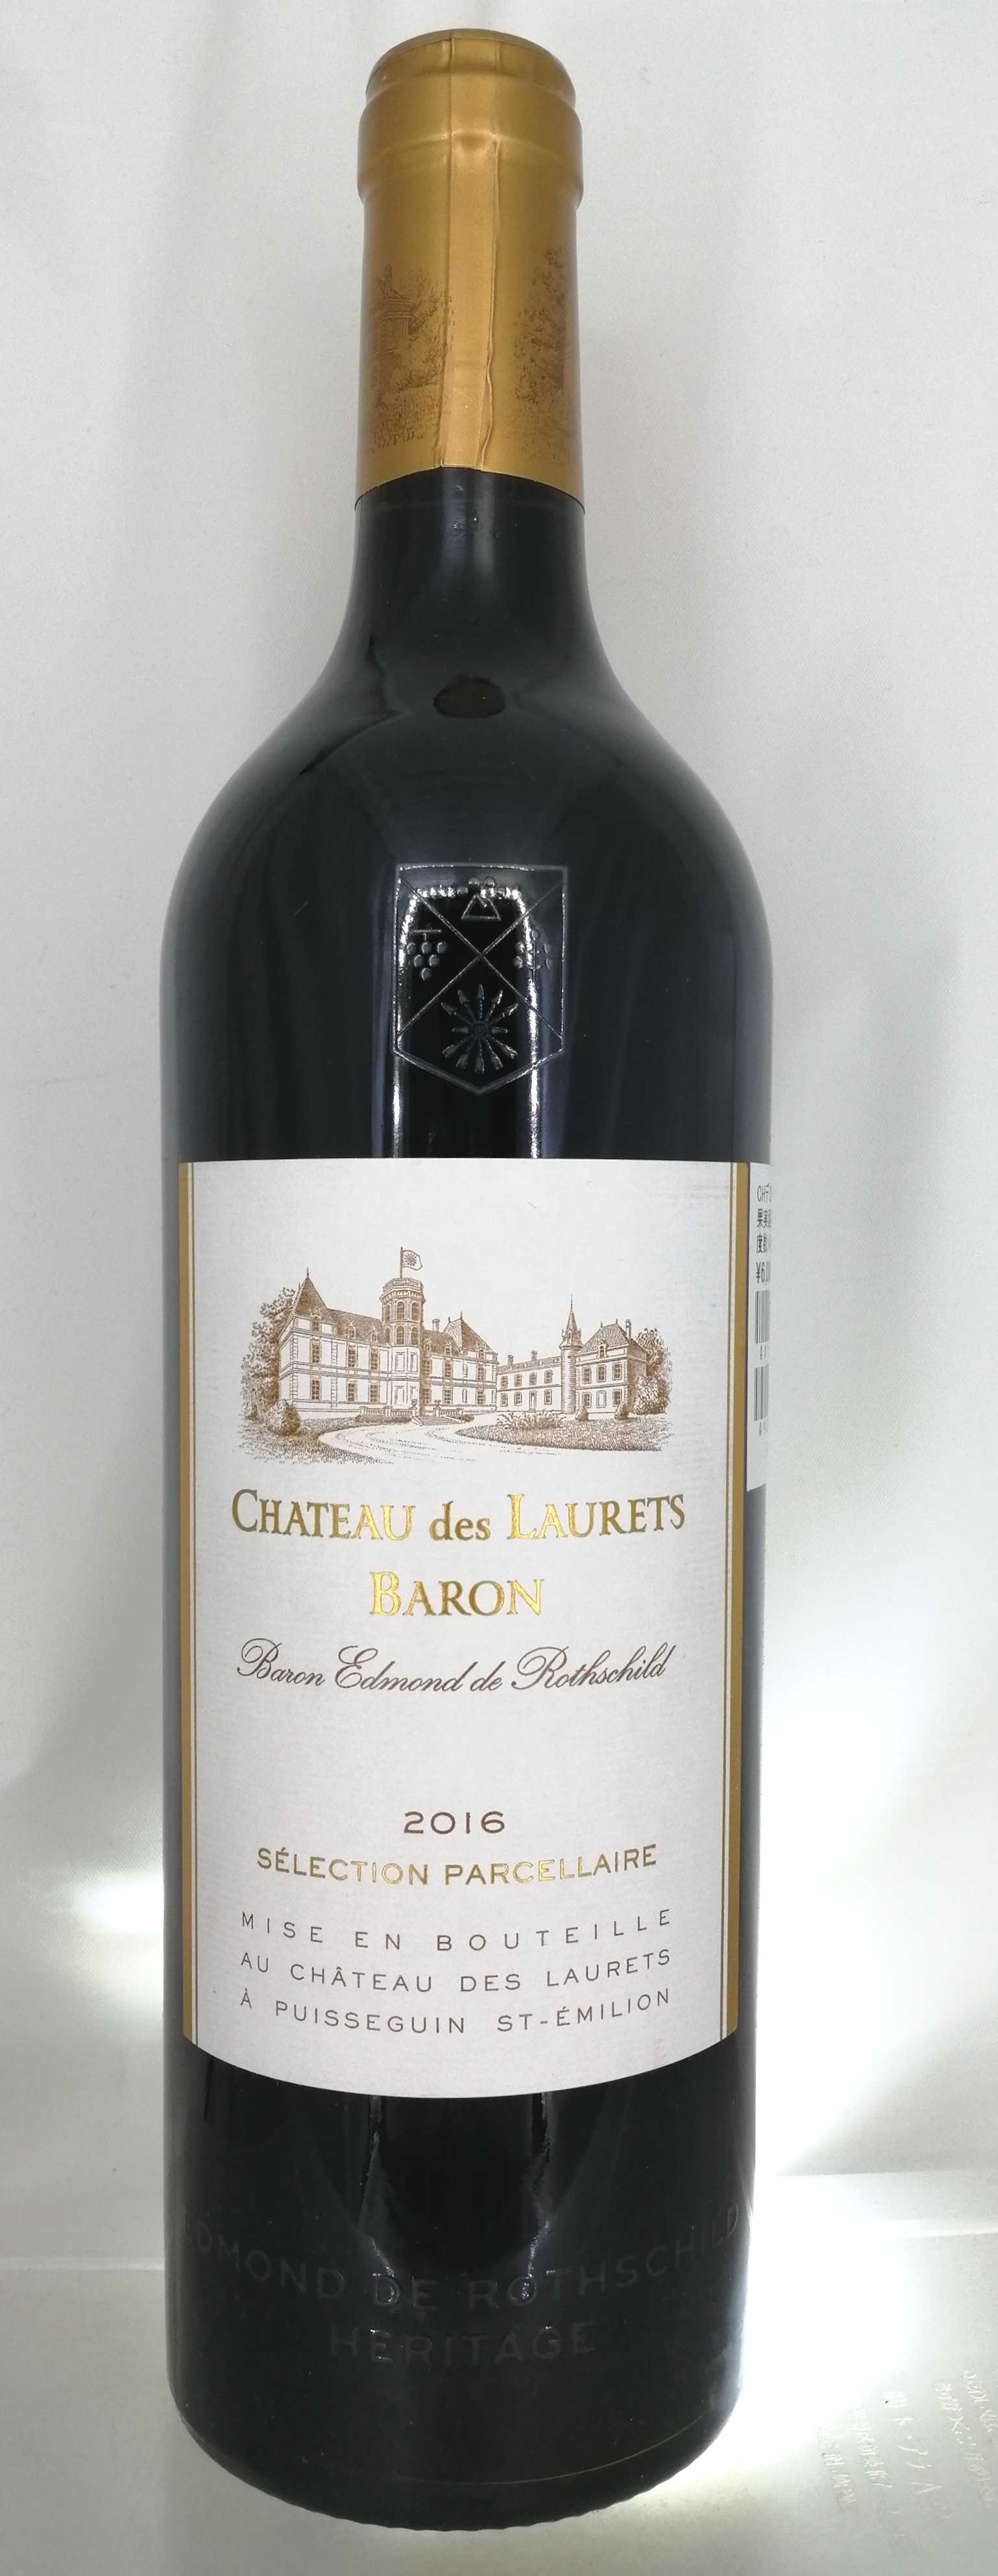 CHデ ローレ バロン2016|ch.des laurets baron